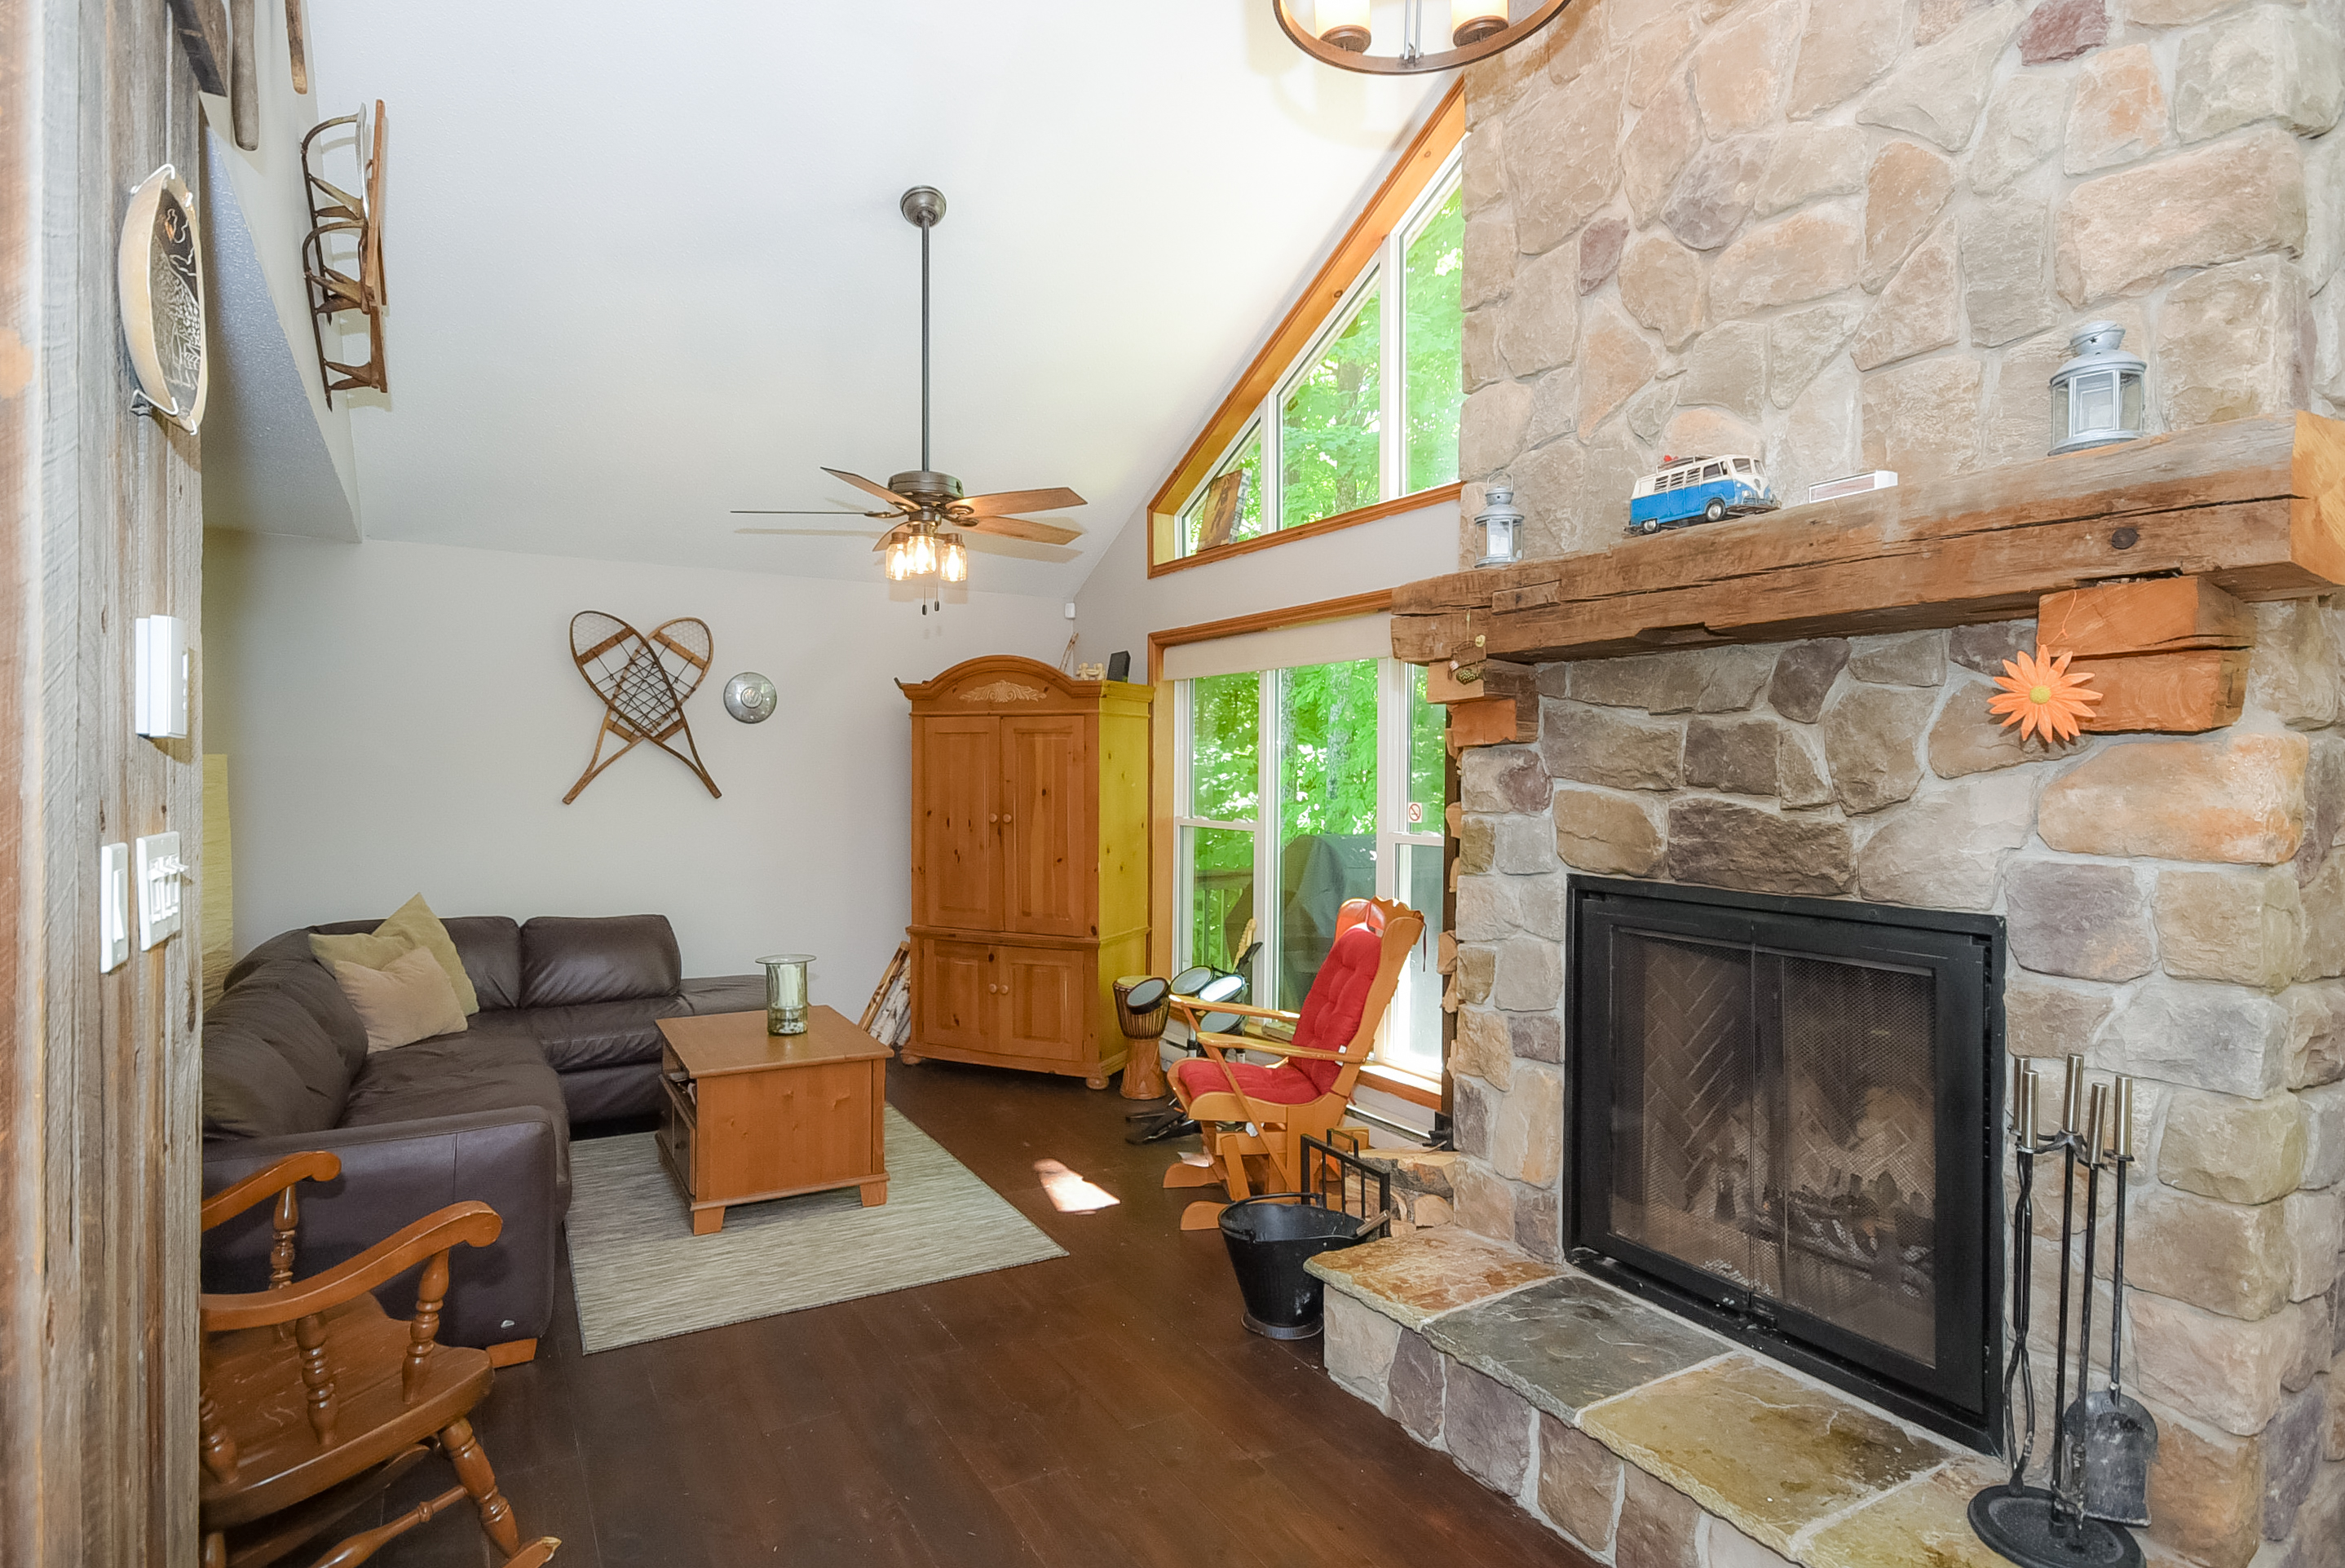 14 ch des cedres,Northfield,Quebec,Canada,3 Bedrooms Bedrooms,2 BathroomsBathrooms,Cottage,Flower Moon Cottage,ch des cedres,1001